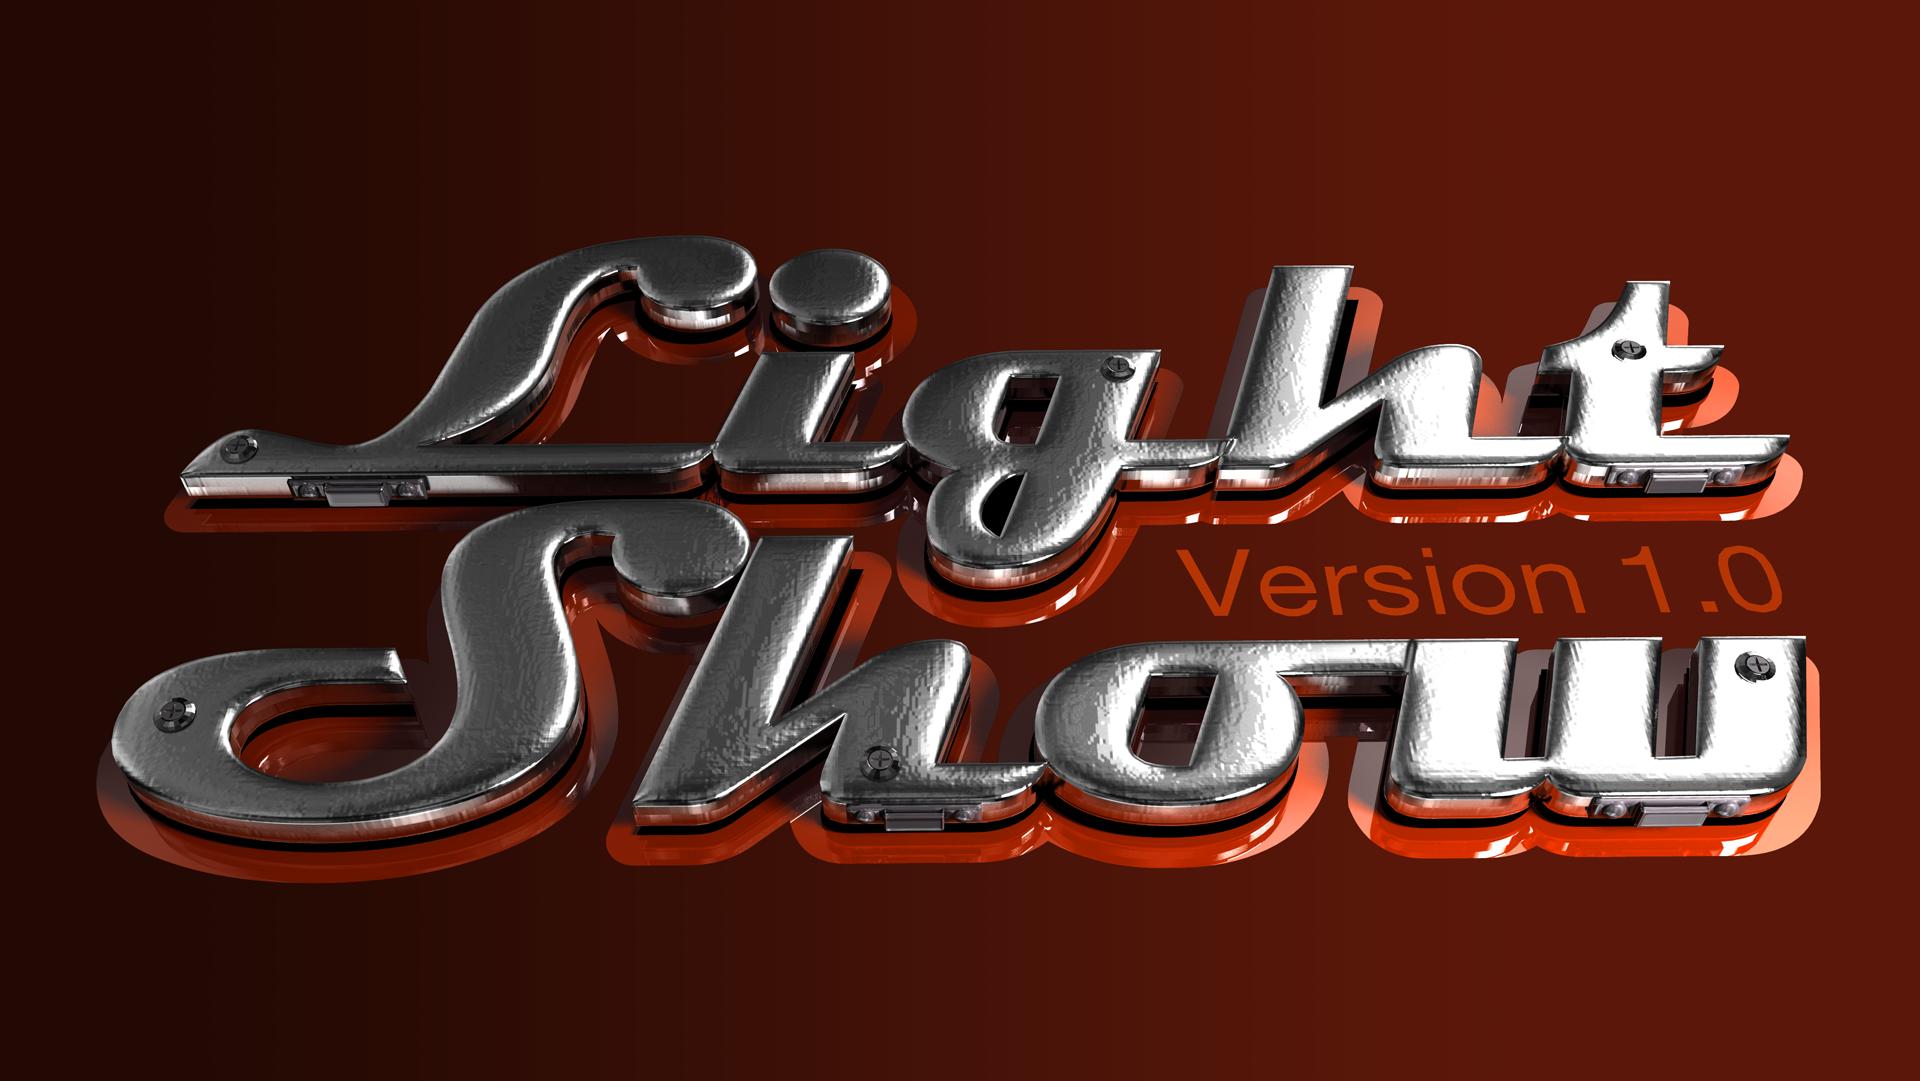 3d logo image